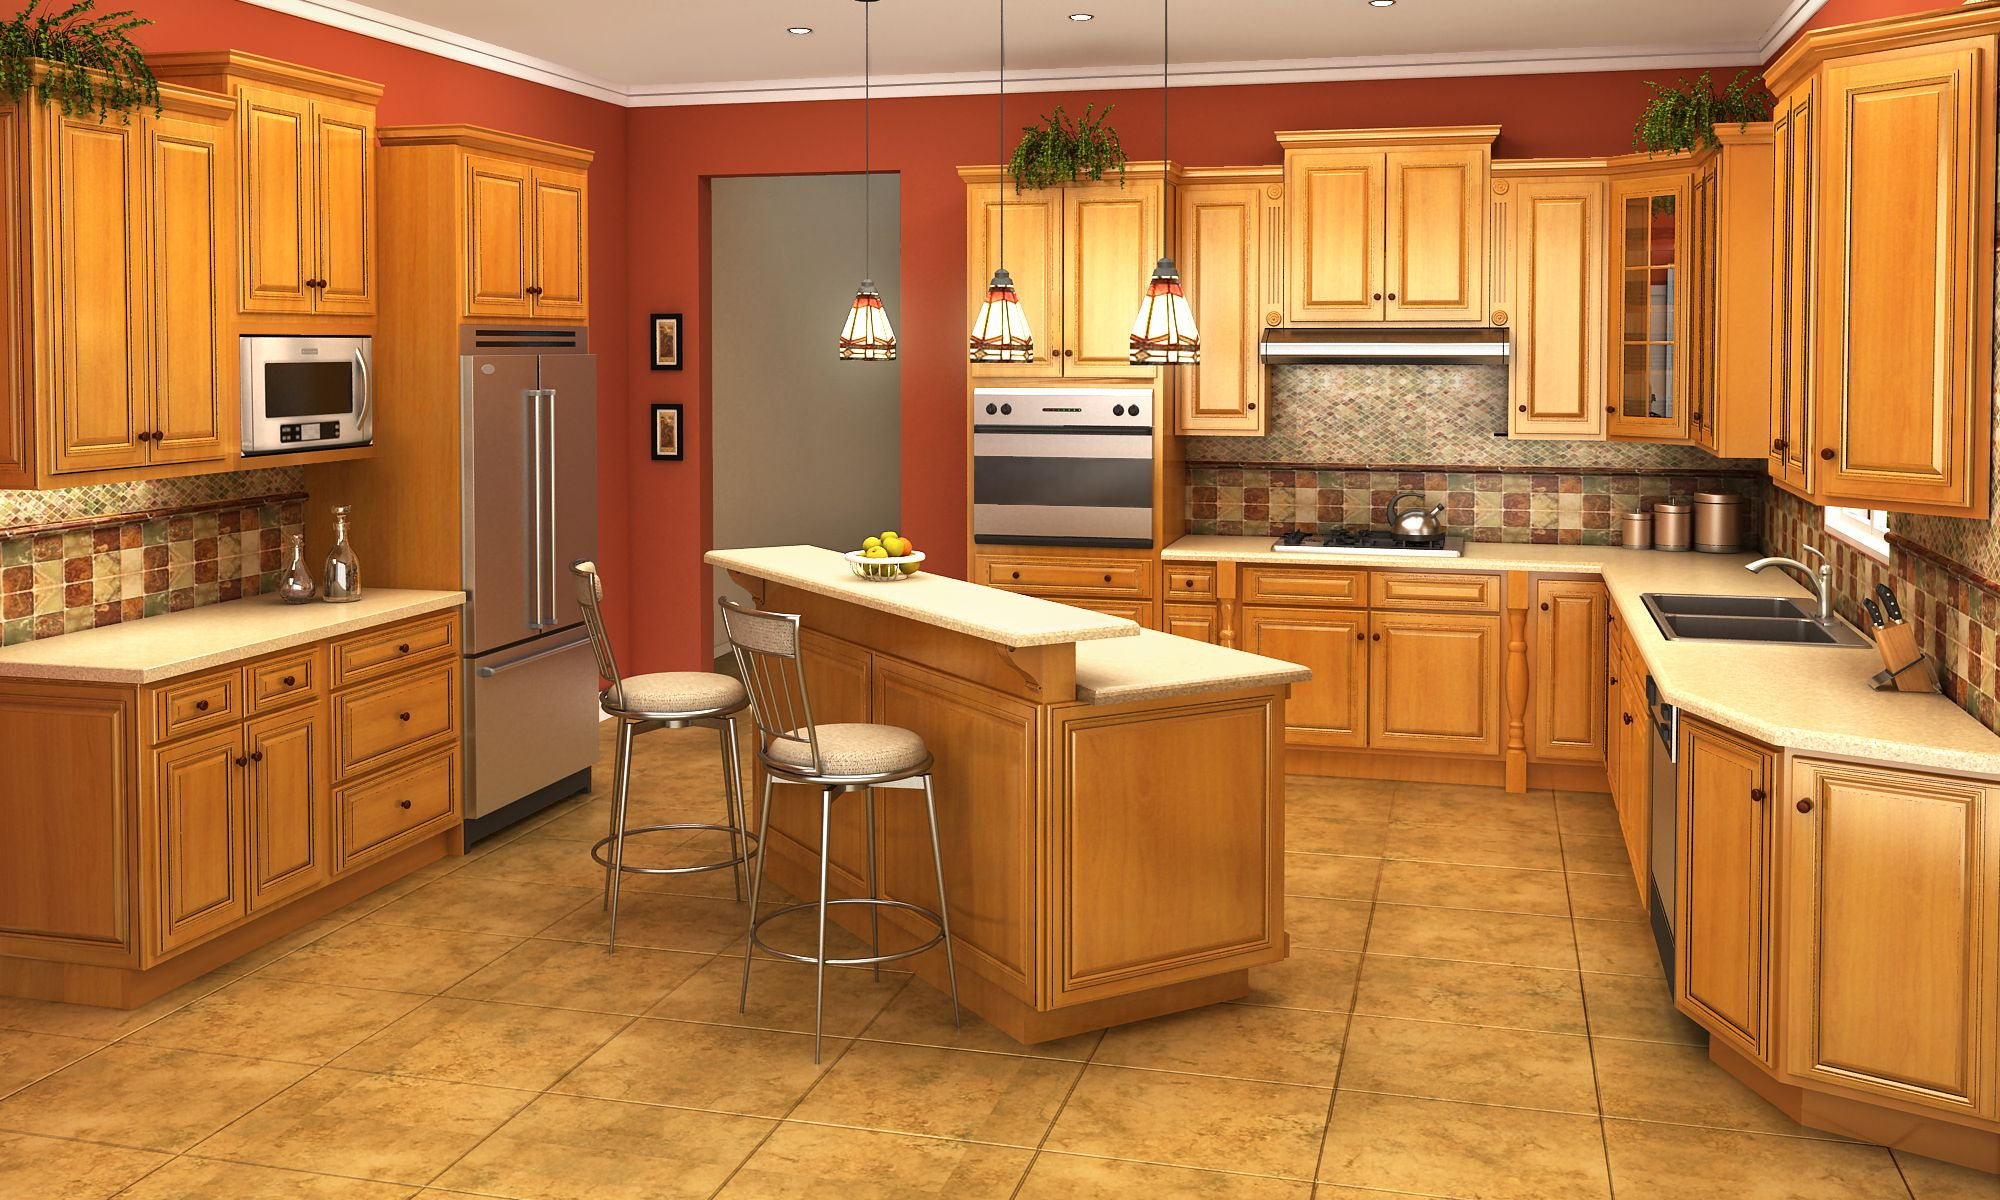 Savannah Cabinet Finish Assembled Kitchen Cabinets Online Kitchen Cabinets Wooden Kitchen Cabinets